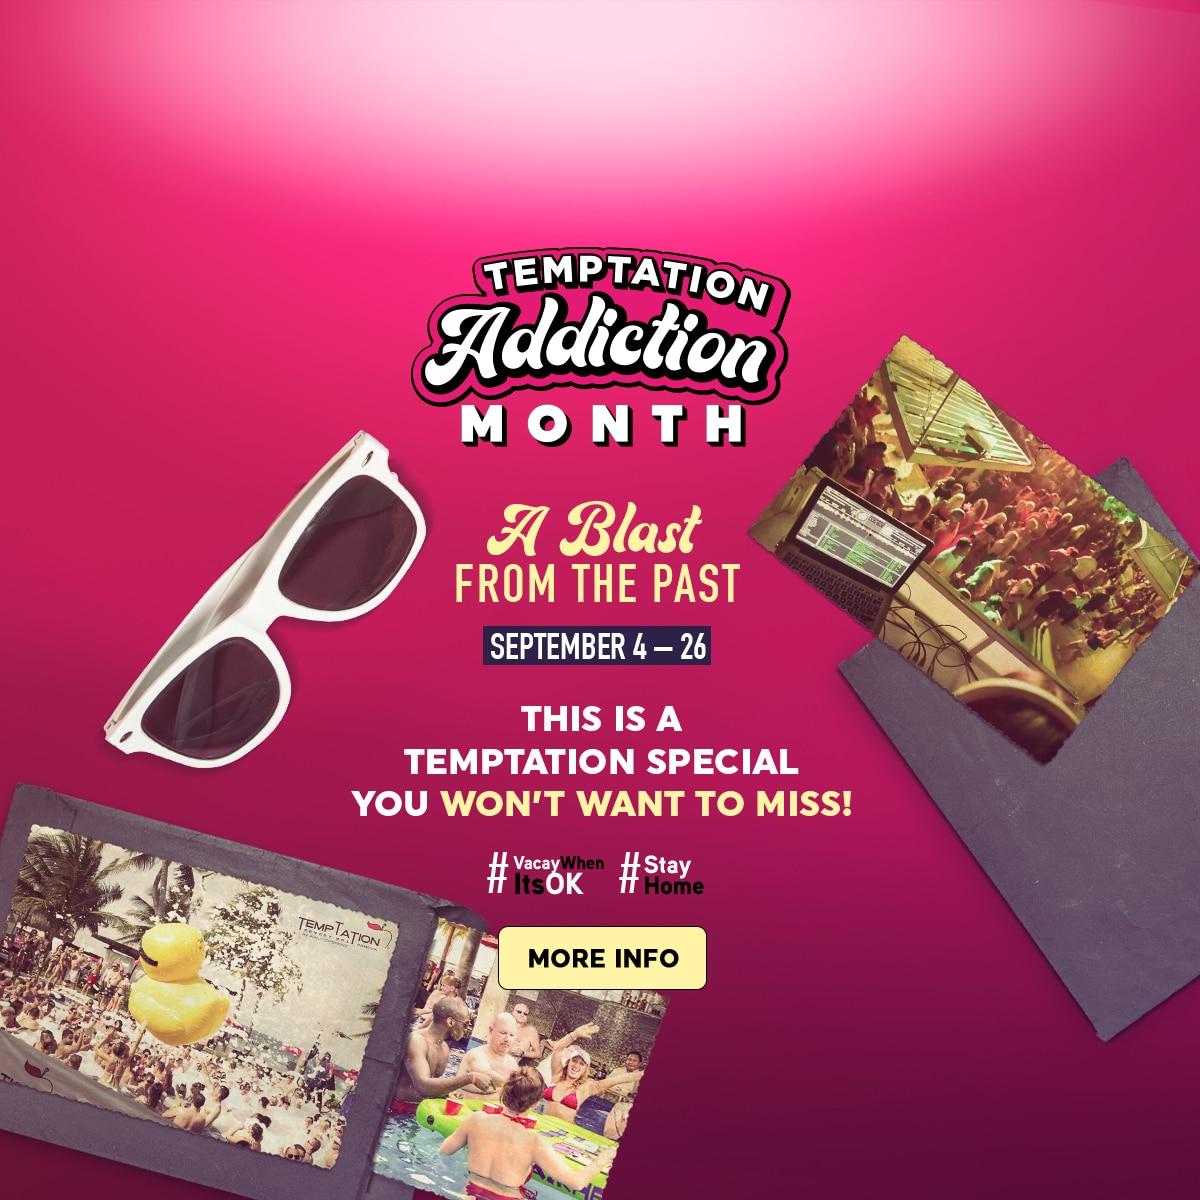 Temptation Addiction Month